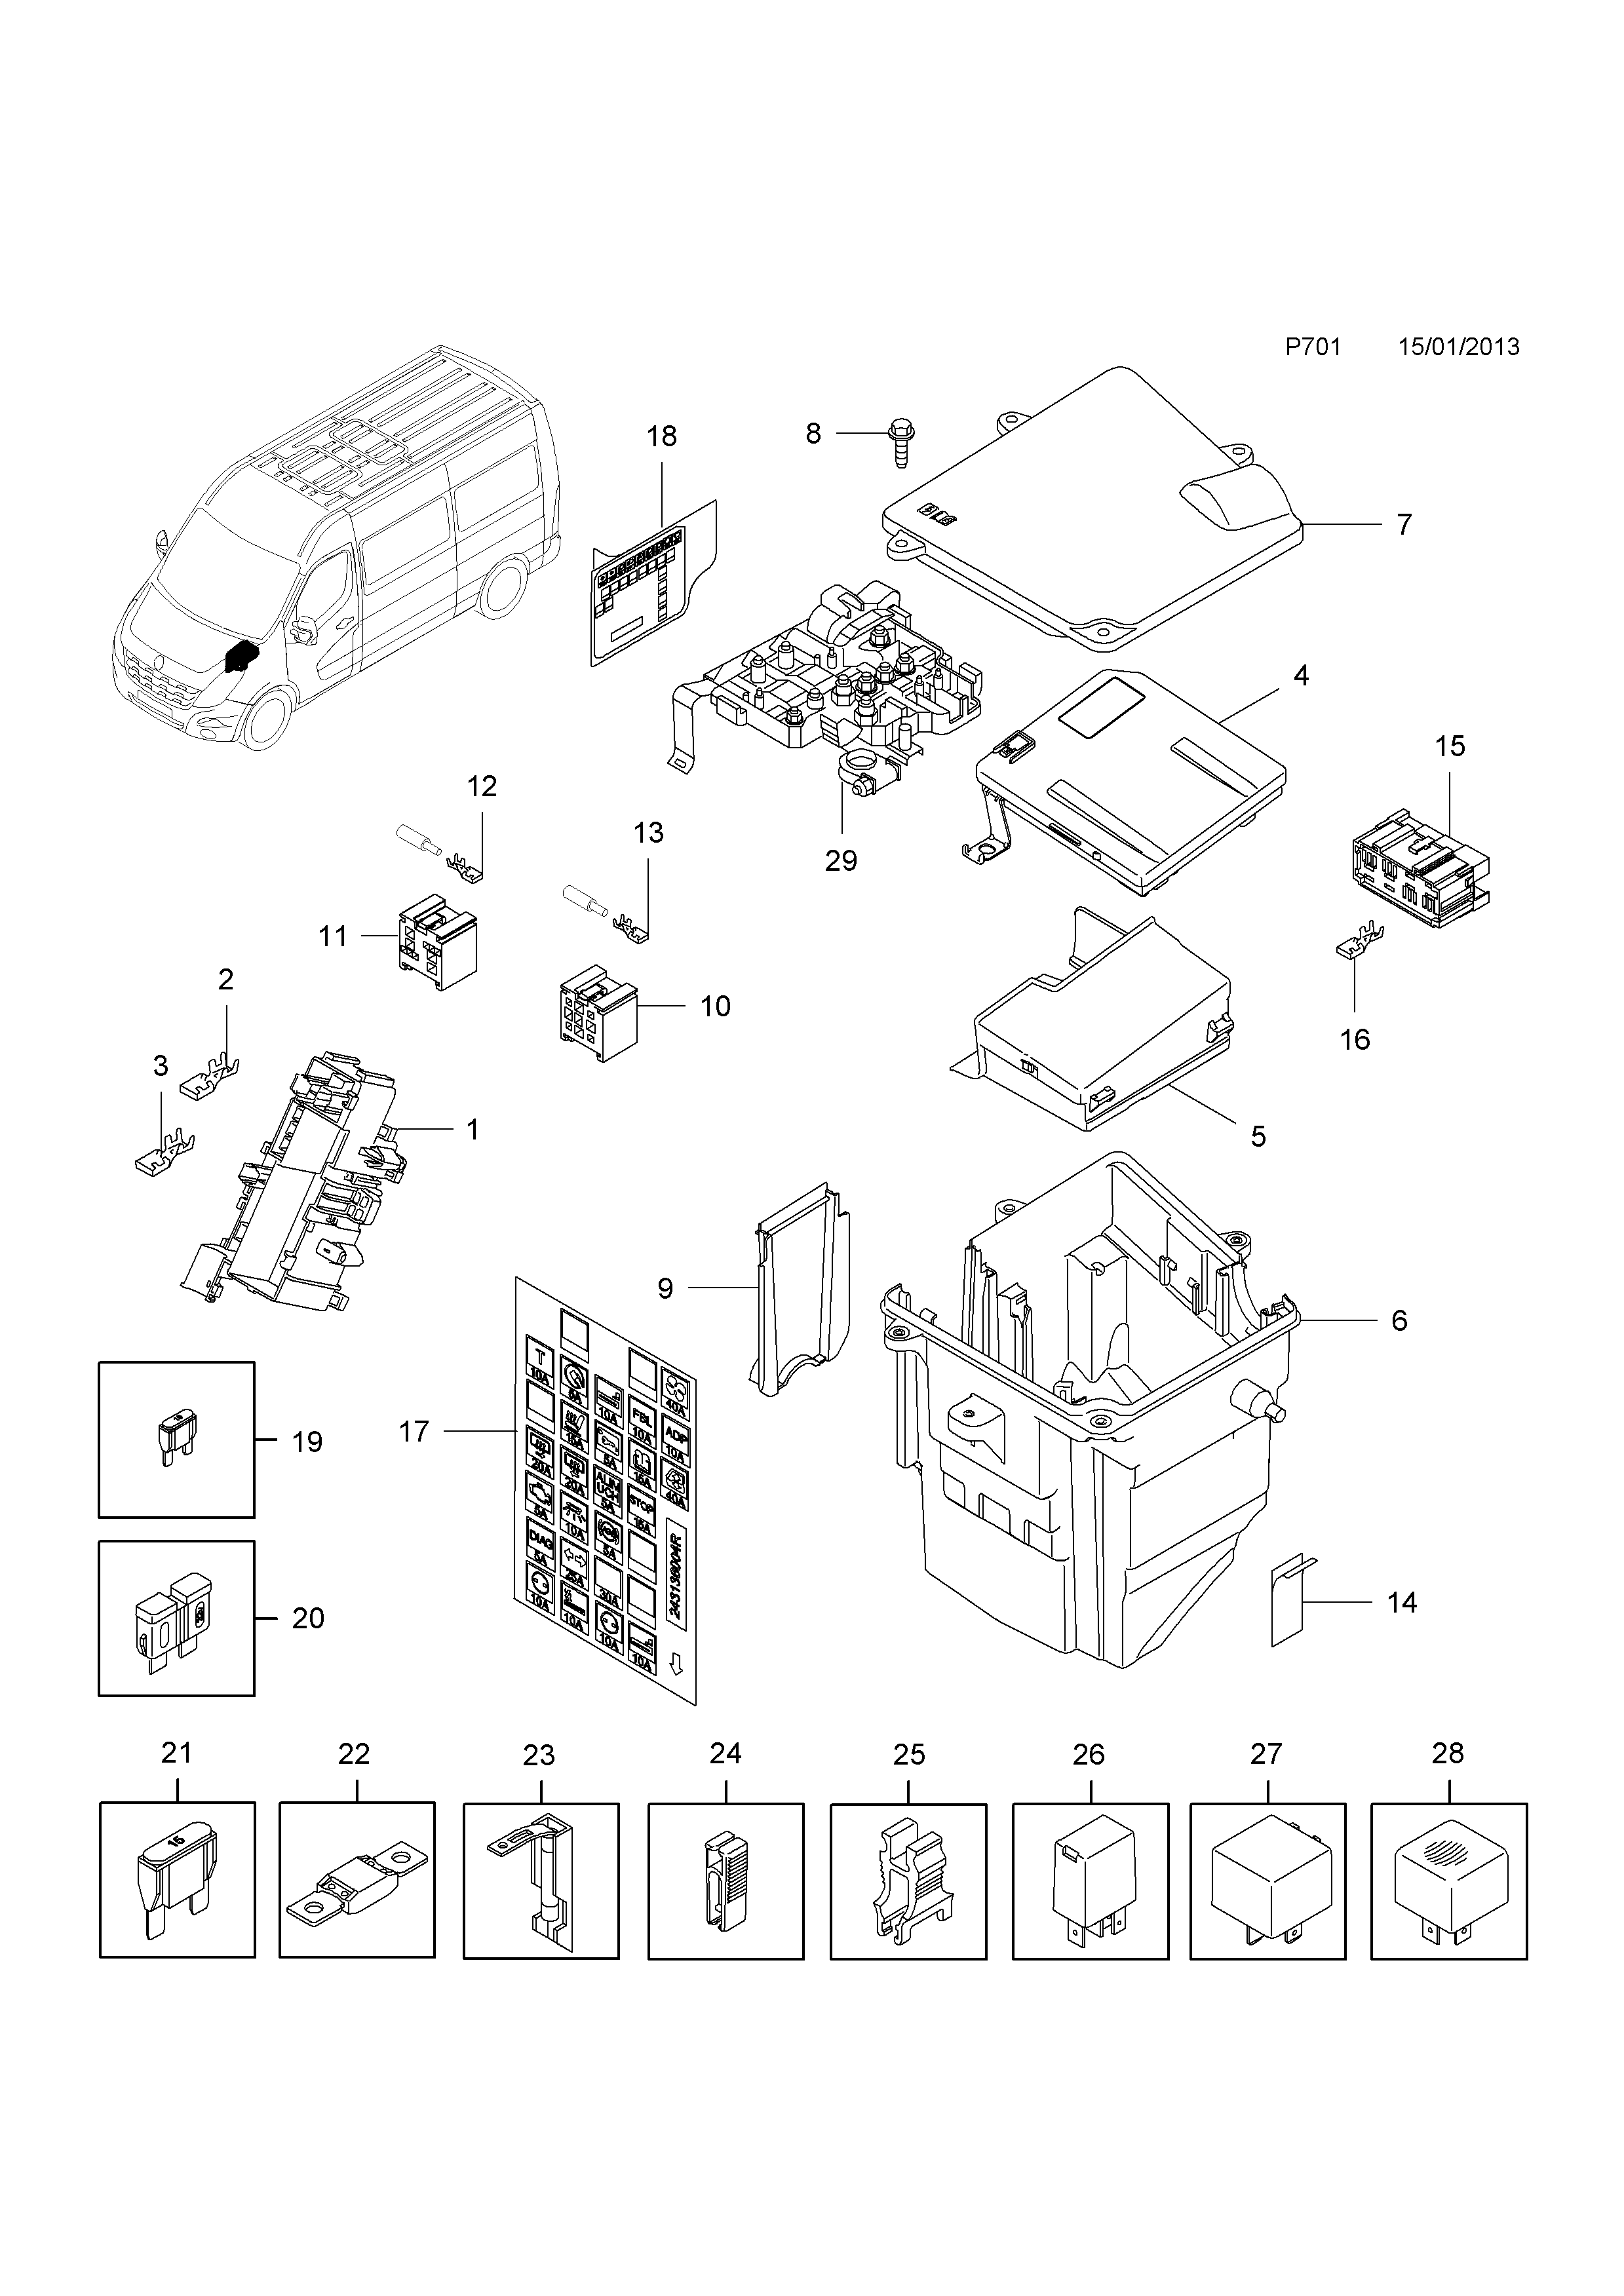 ... №, Gm-part number, Genuine part number, Description, Range. FUSE BOX.